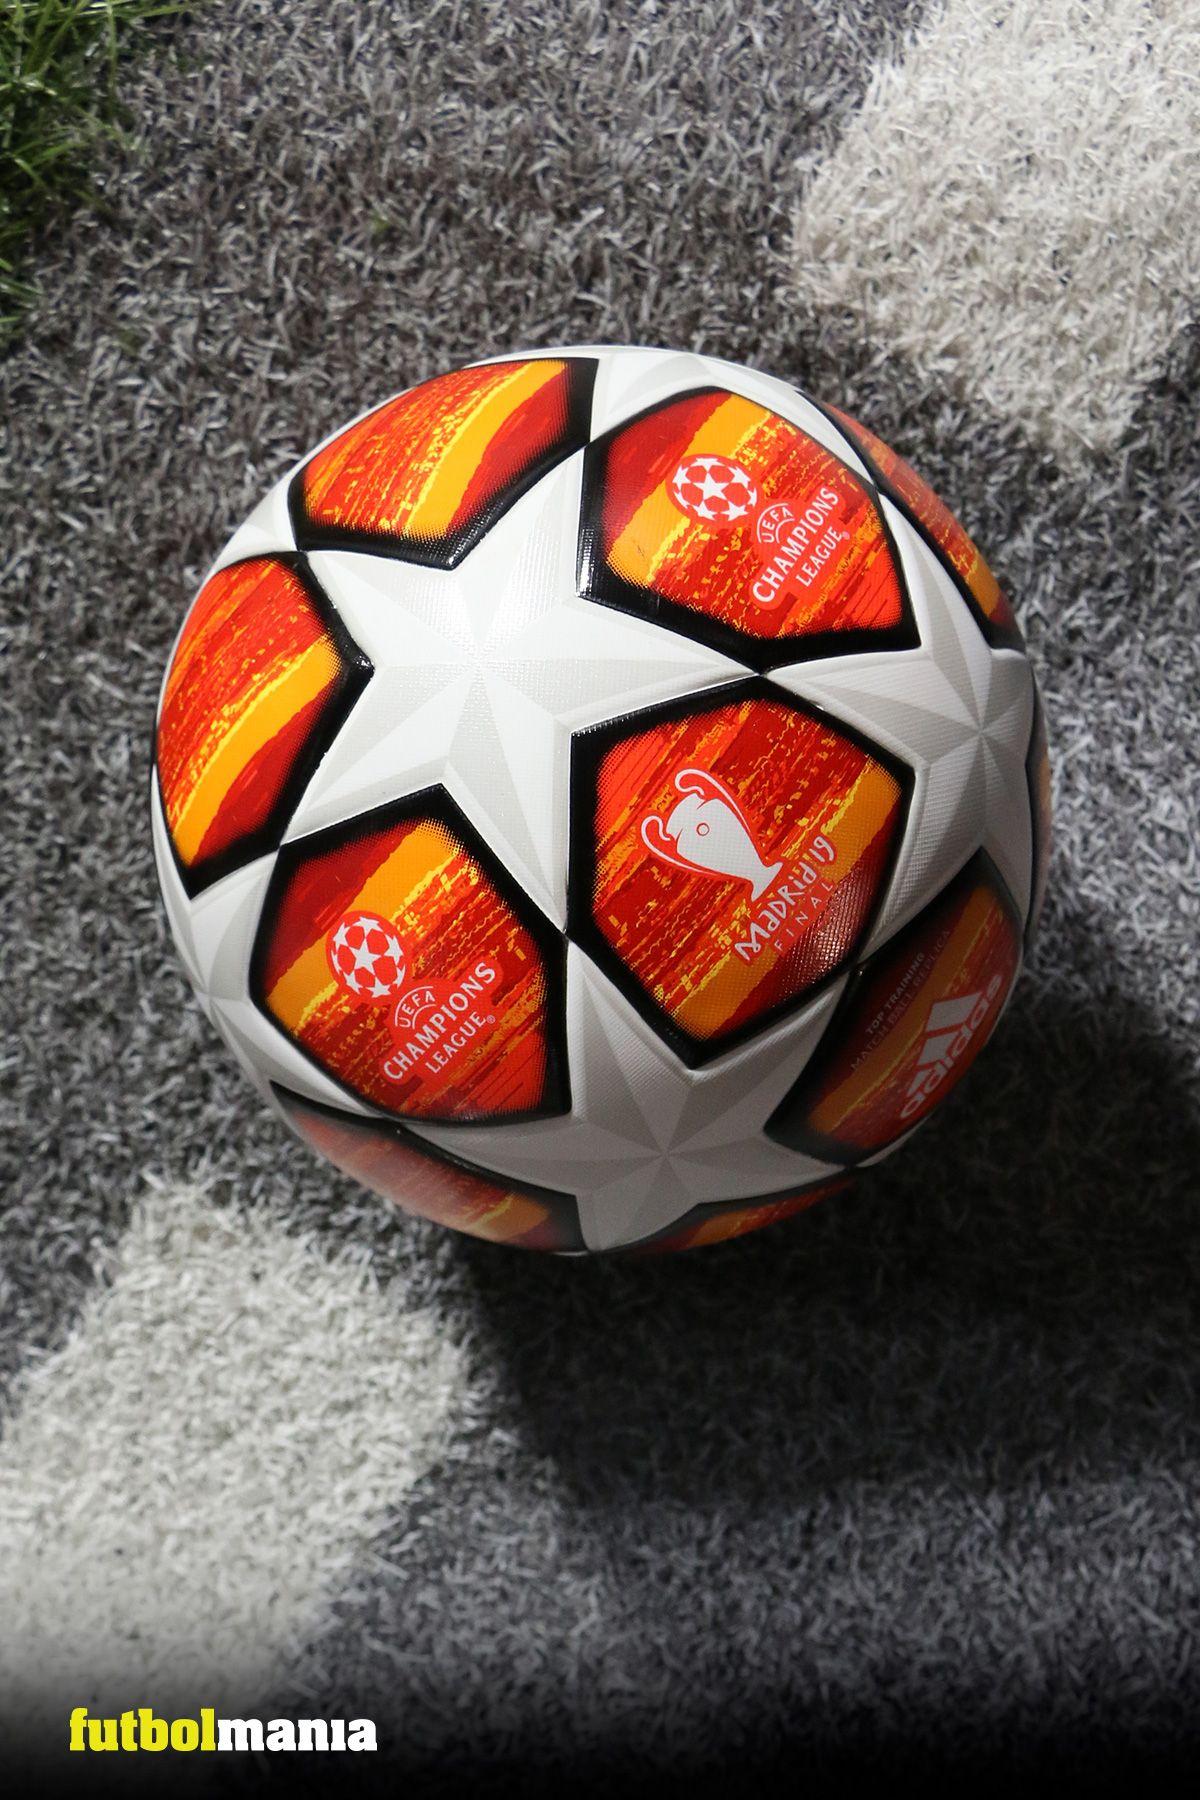 Balón Uefa Champions League Balones De Futbol Adidas Balones Pelota De Fútbol